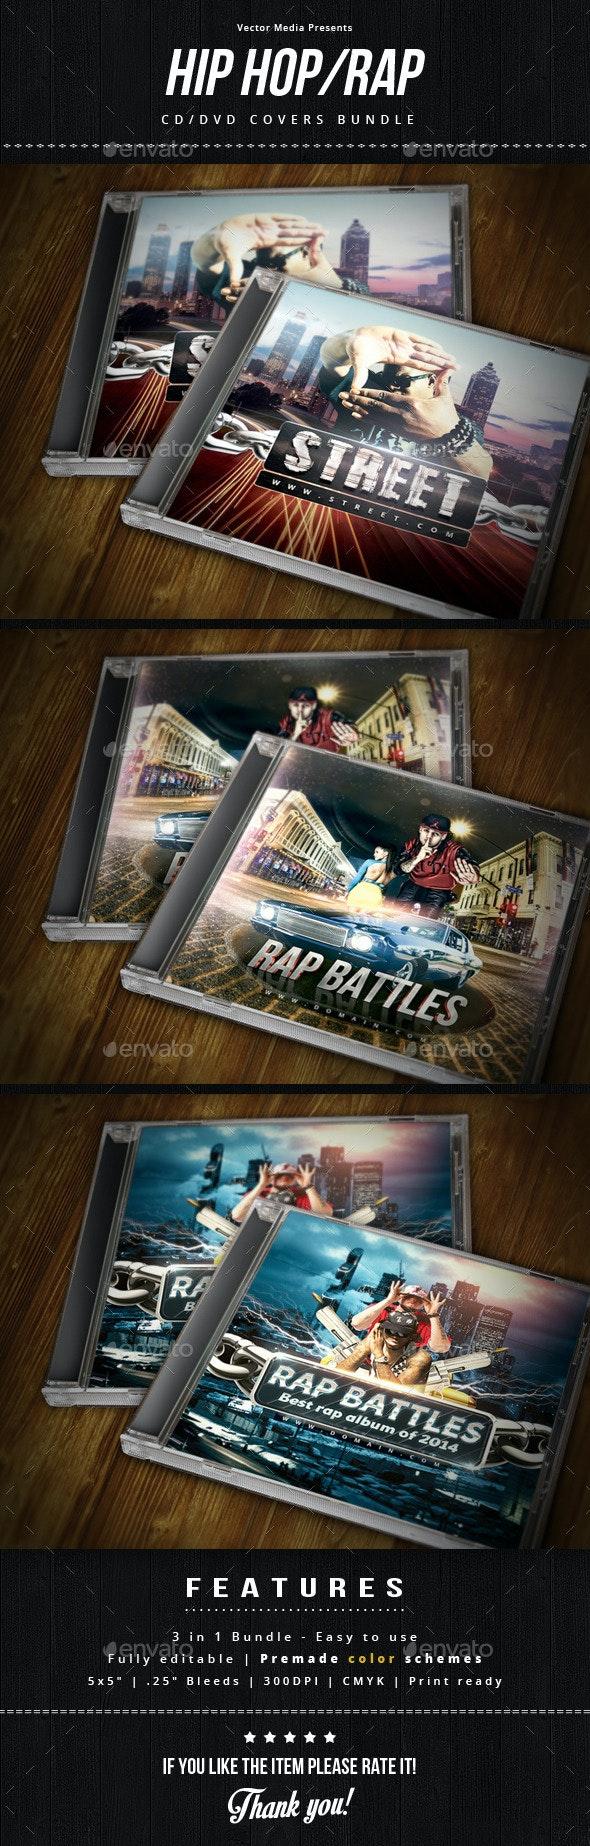 Hip Hop / Rap - Cd Covers Bundle - CD & DVD Artwork Print Templates